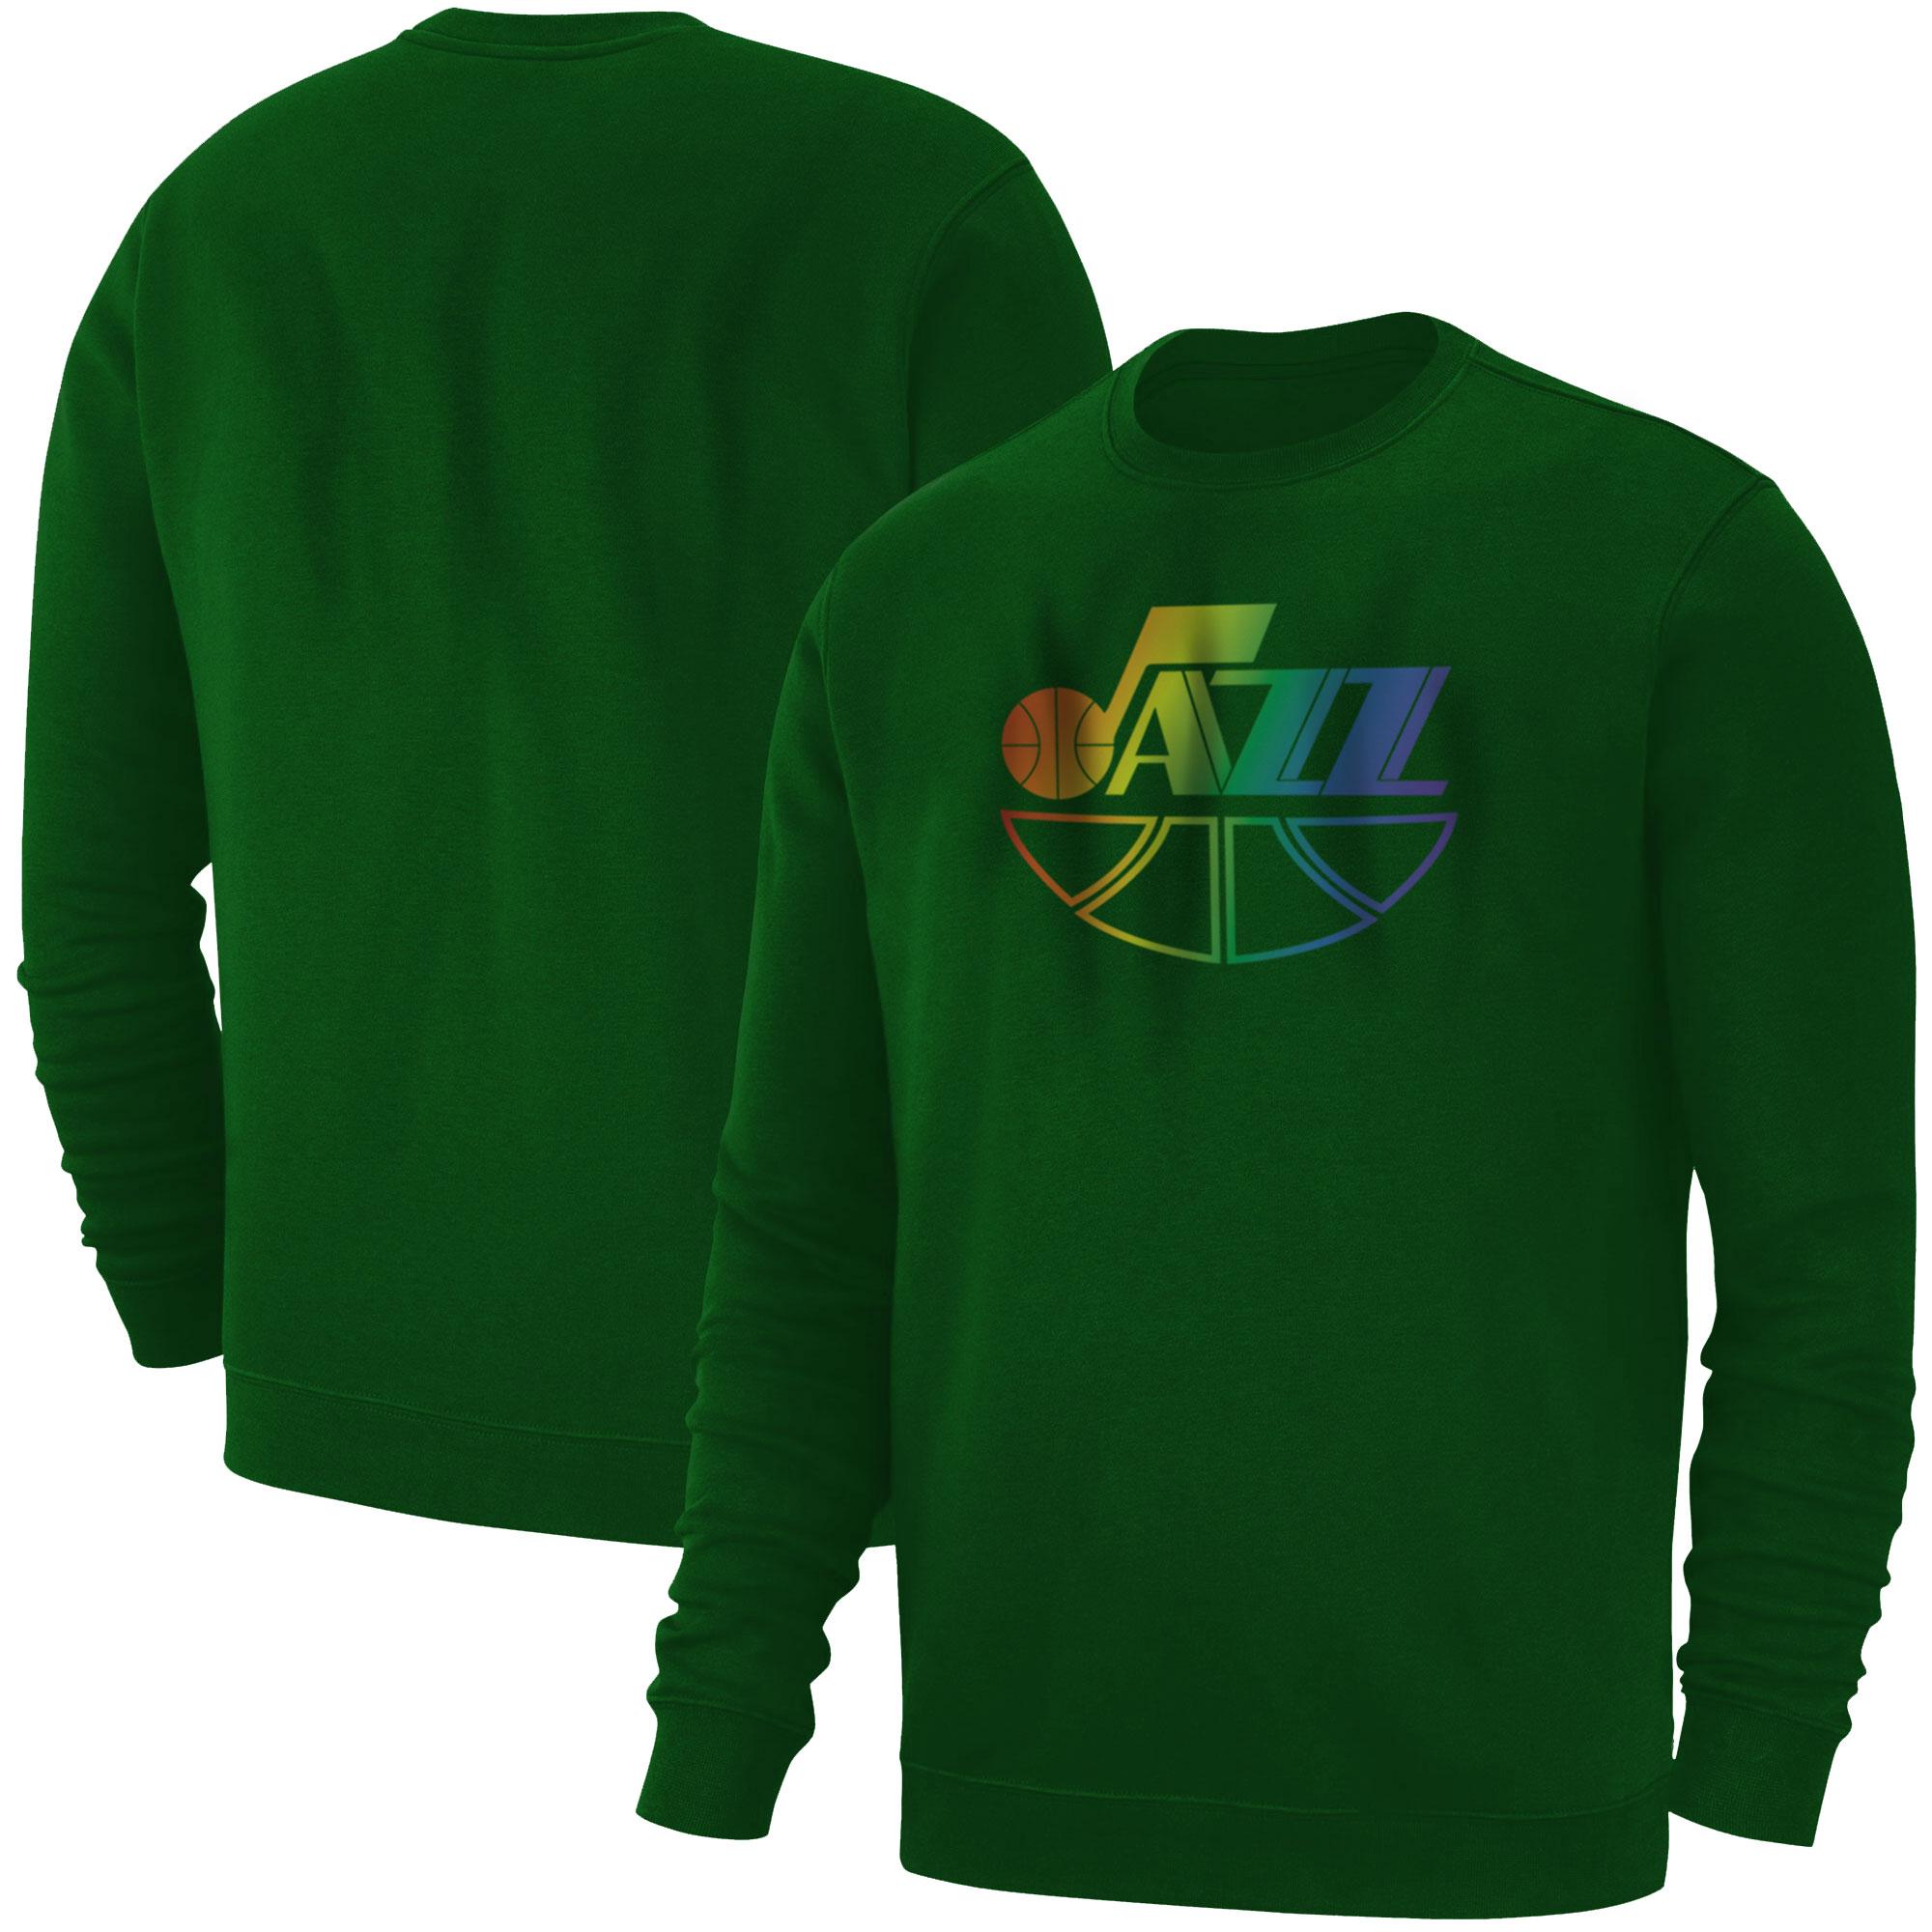 Utah Jazz Basic  (BSC-GRN-501-NBA-UTH)